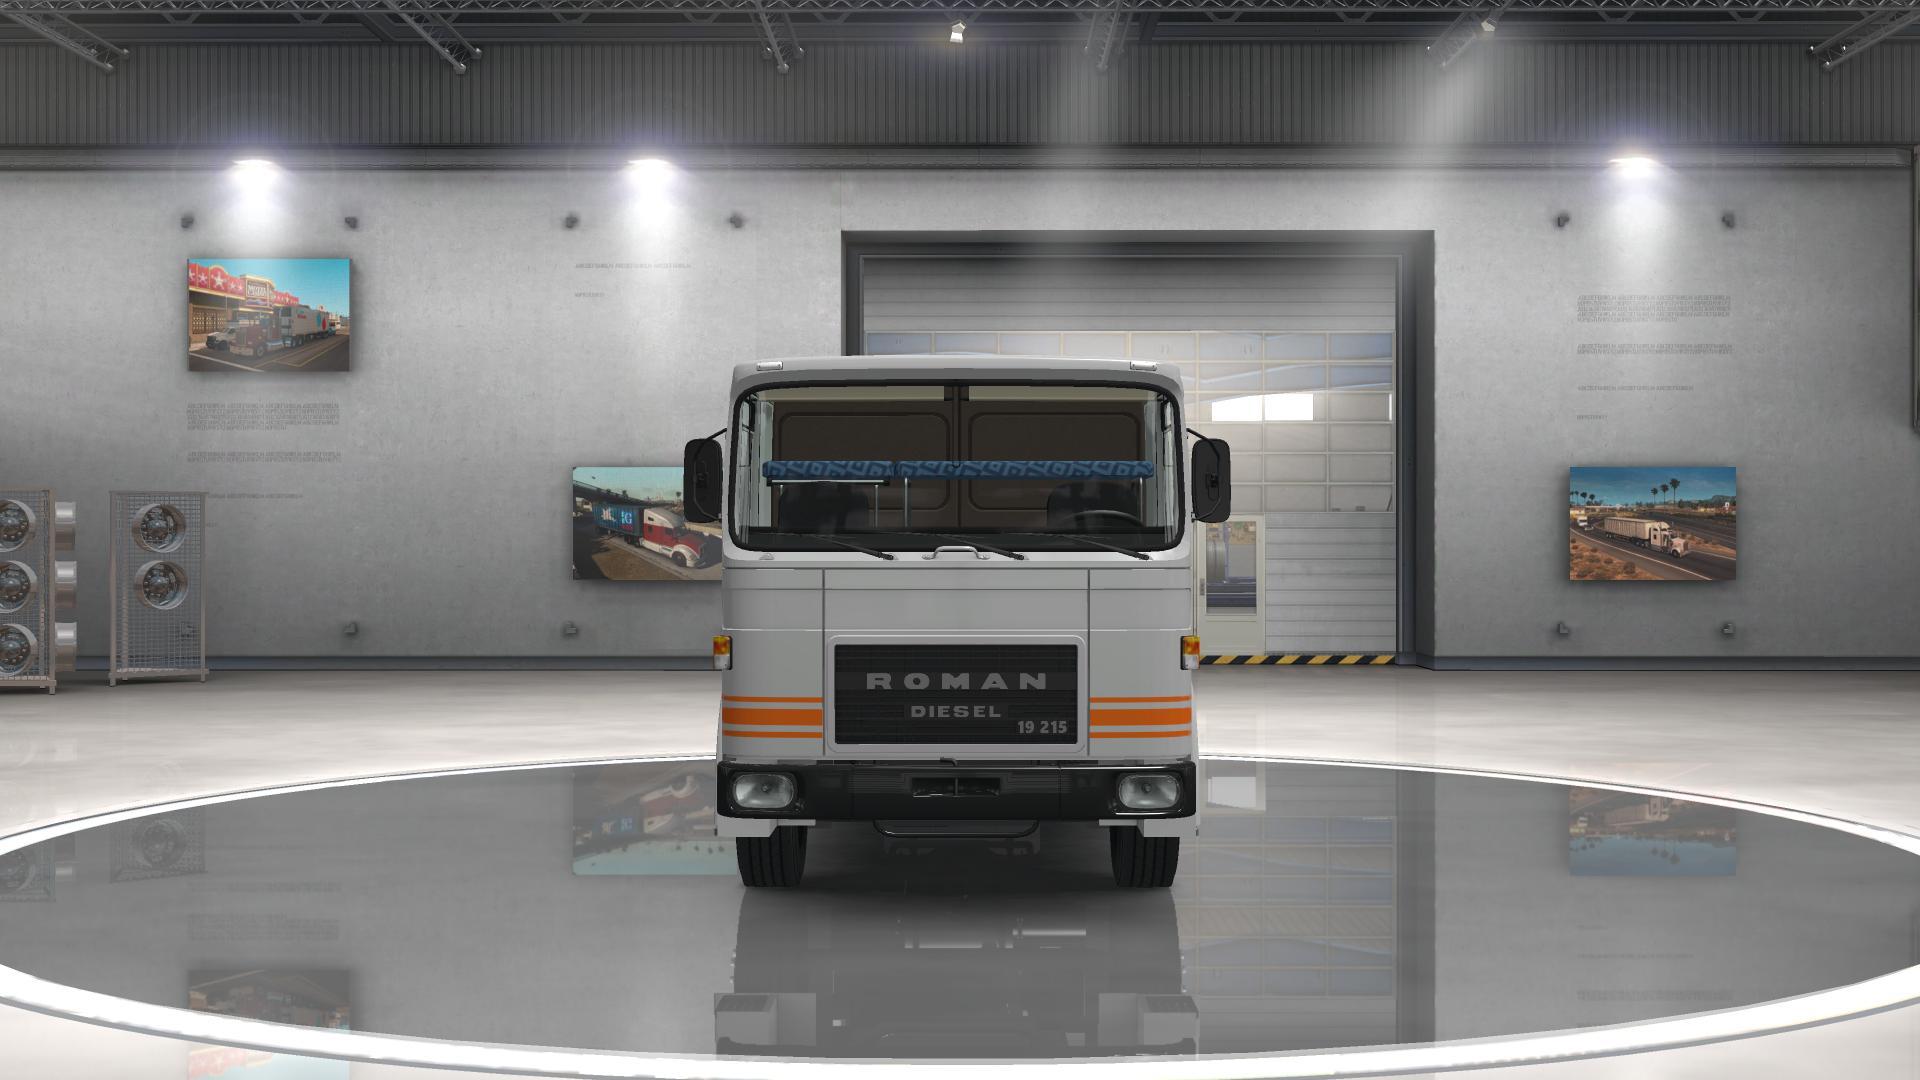 ROMAN Diesel v 1.1